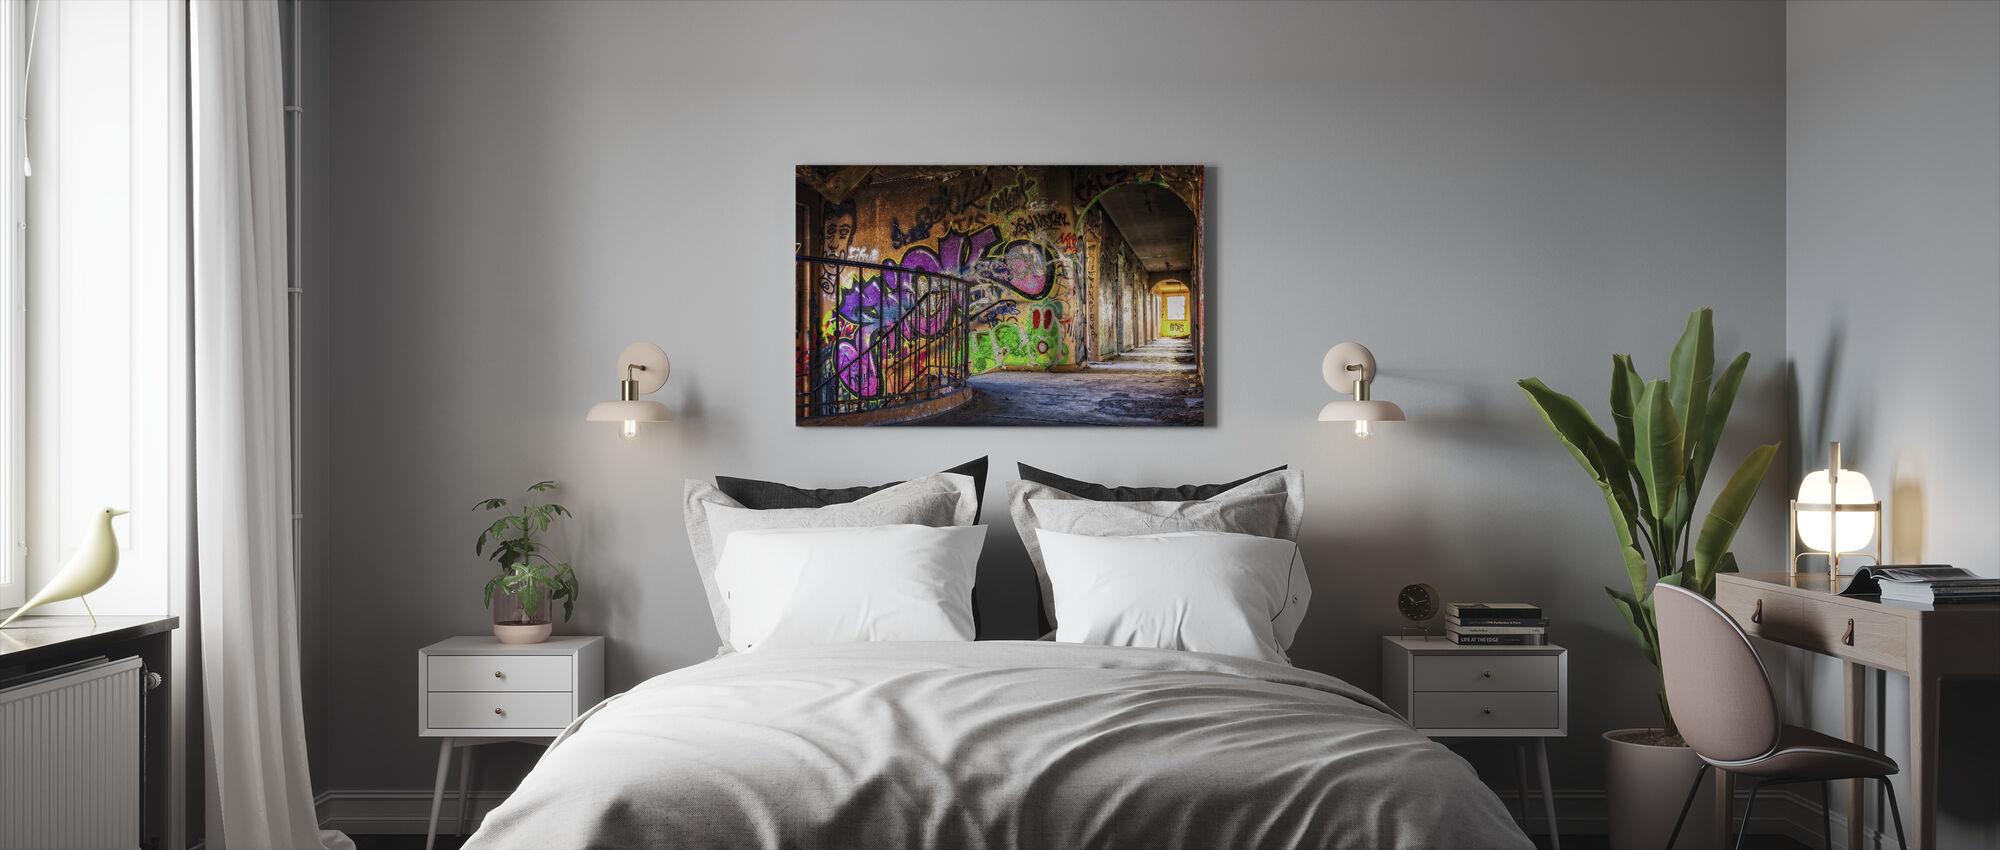 Colorful Grafitti - Canvastavla - Sovrum